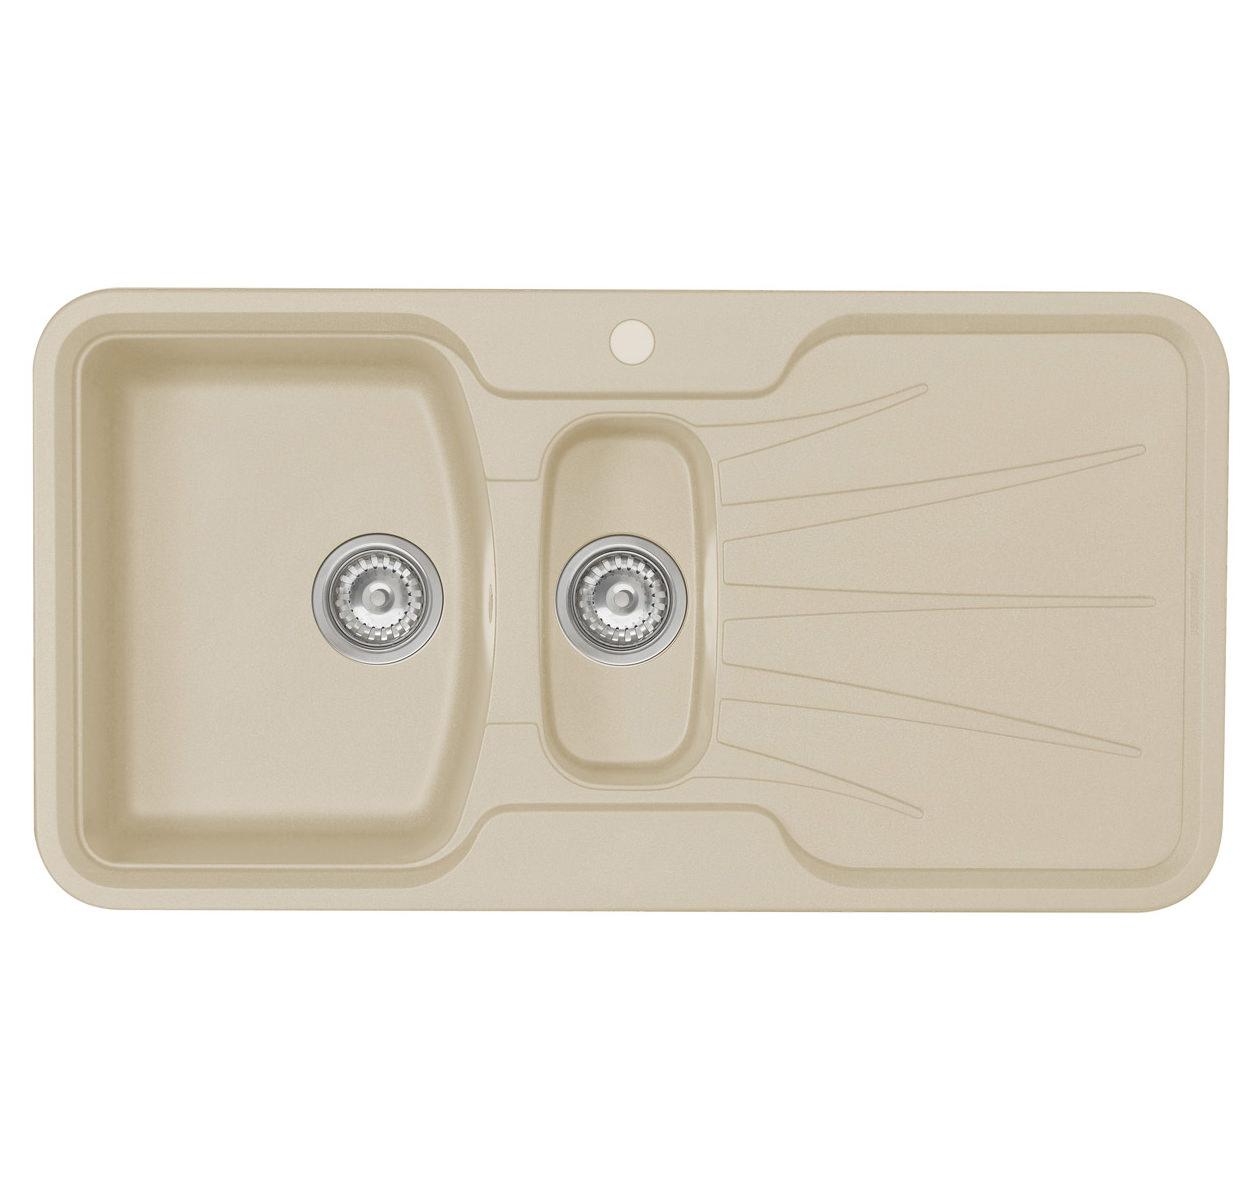 Rok Granite Sinks : ... Korona 1.5 Bowl Composite ROK Granite Inset Sink - KO15RHHOMESK